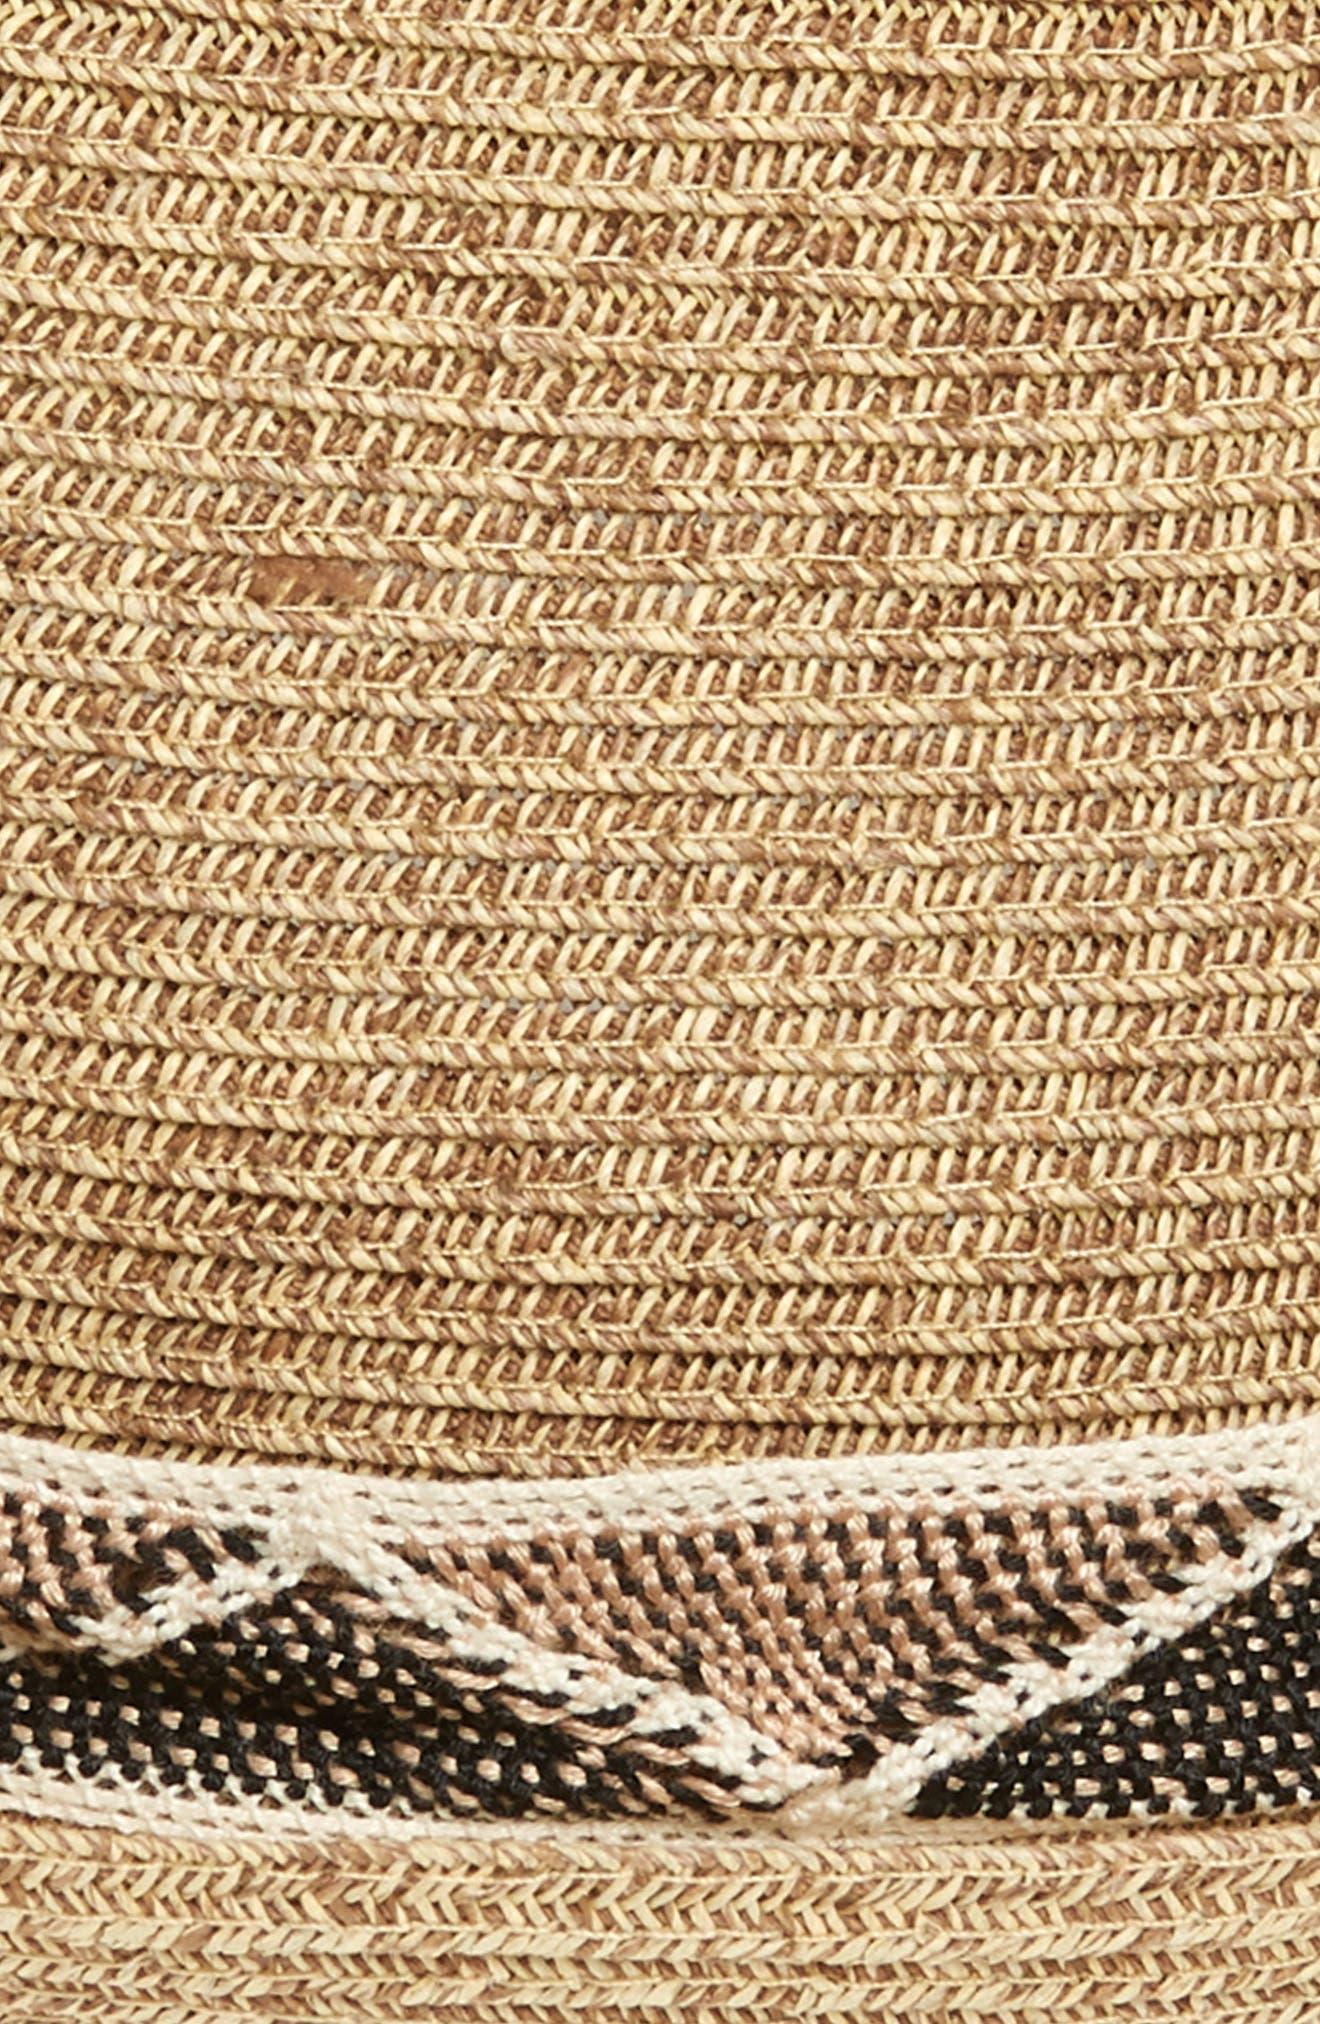 Albuquerque Straw Hat,                             Alternate thumbnail 2, color,                             201